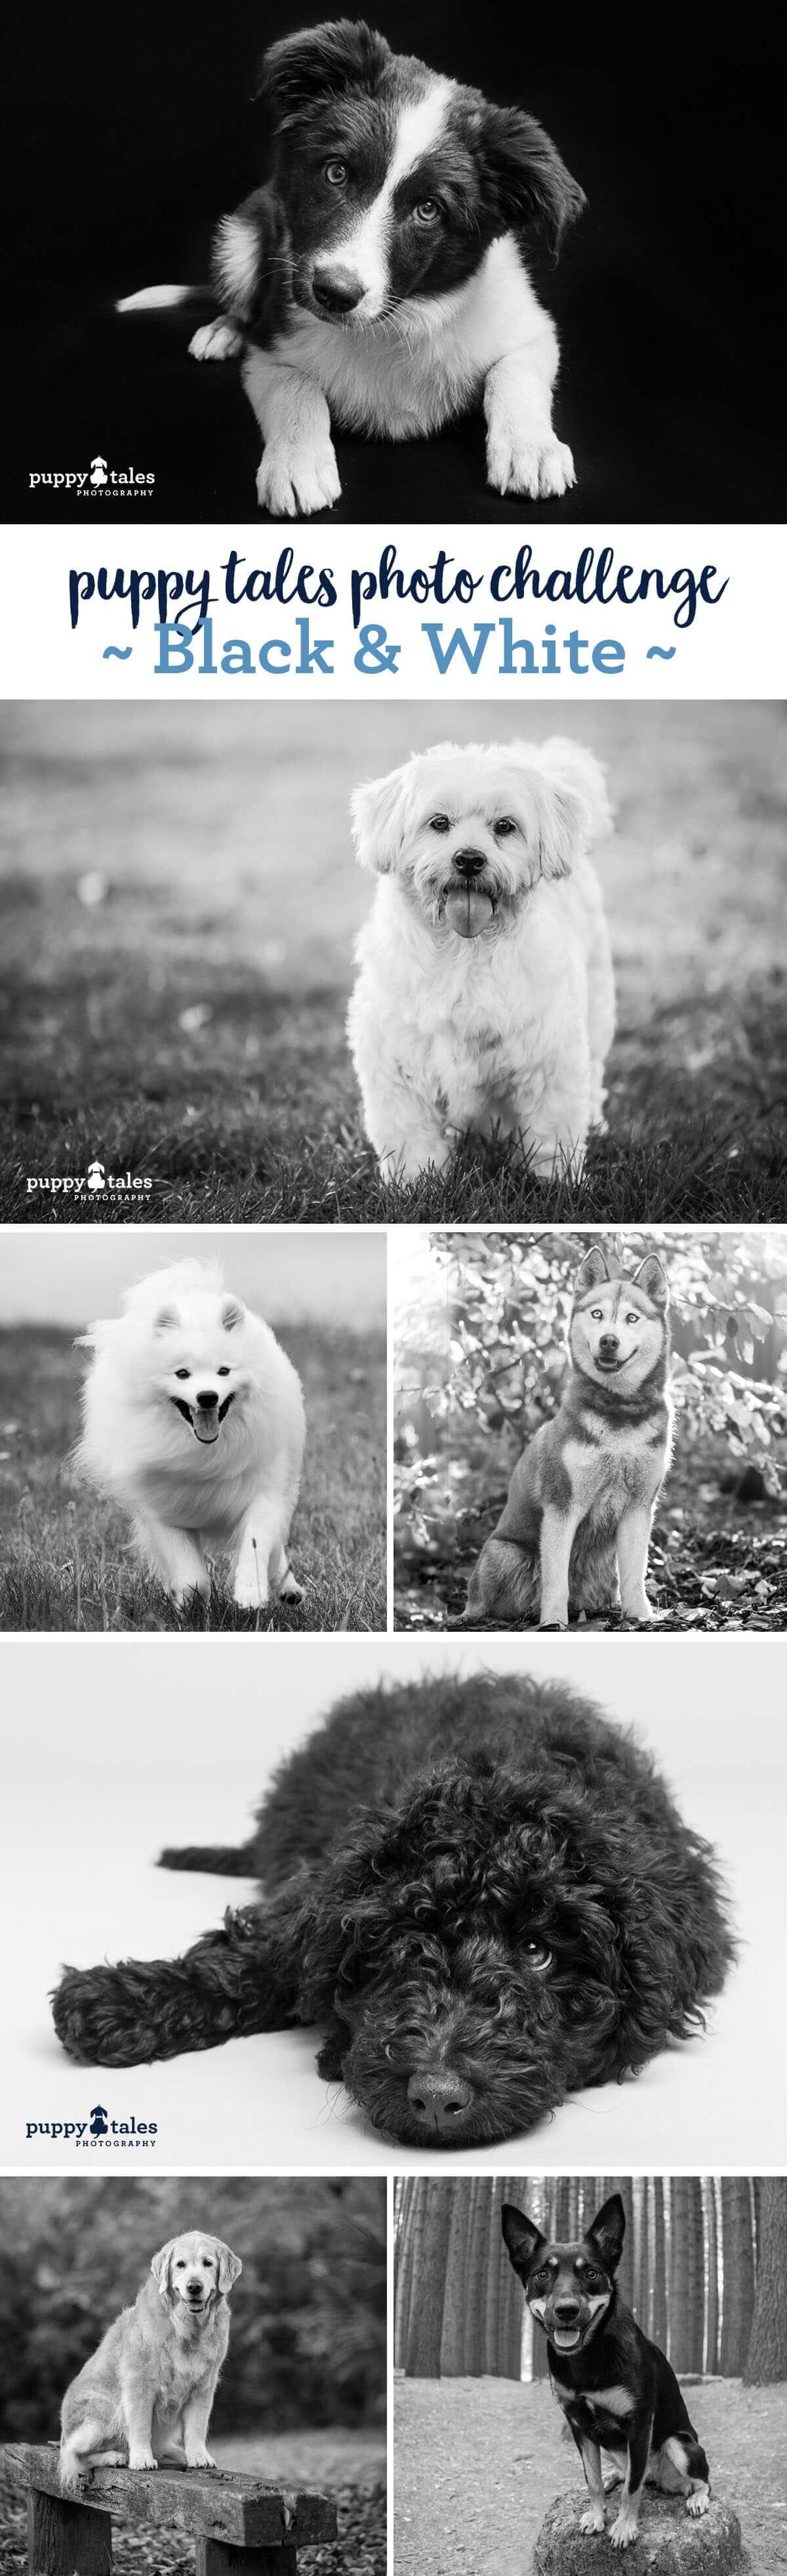 Puppy Tales Photo Challenge ~ Black & White